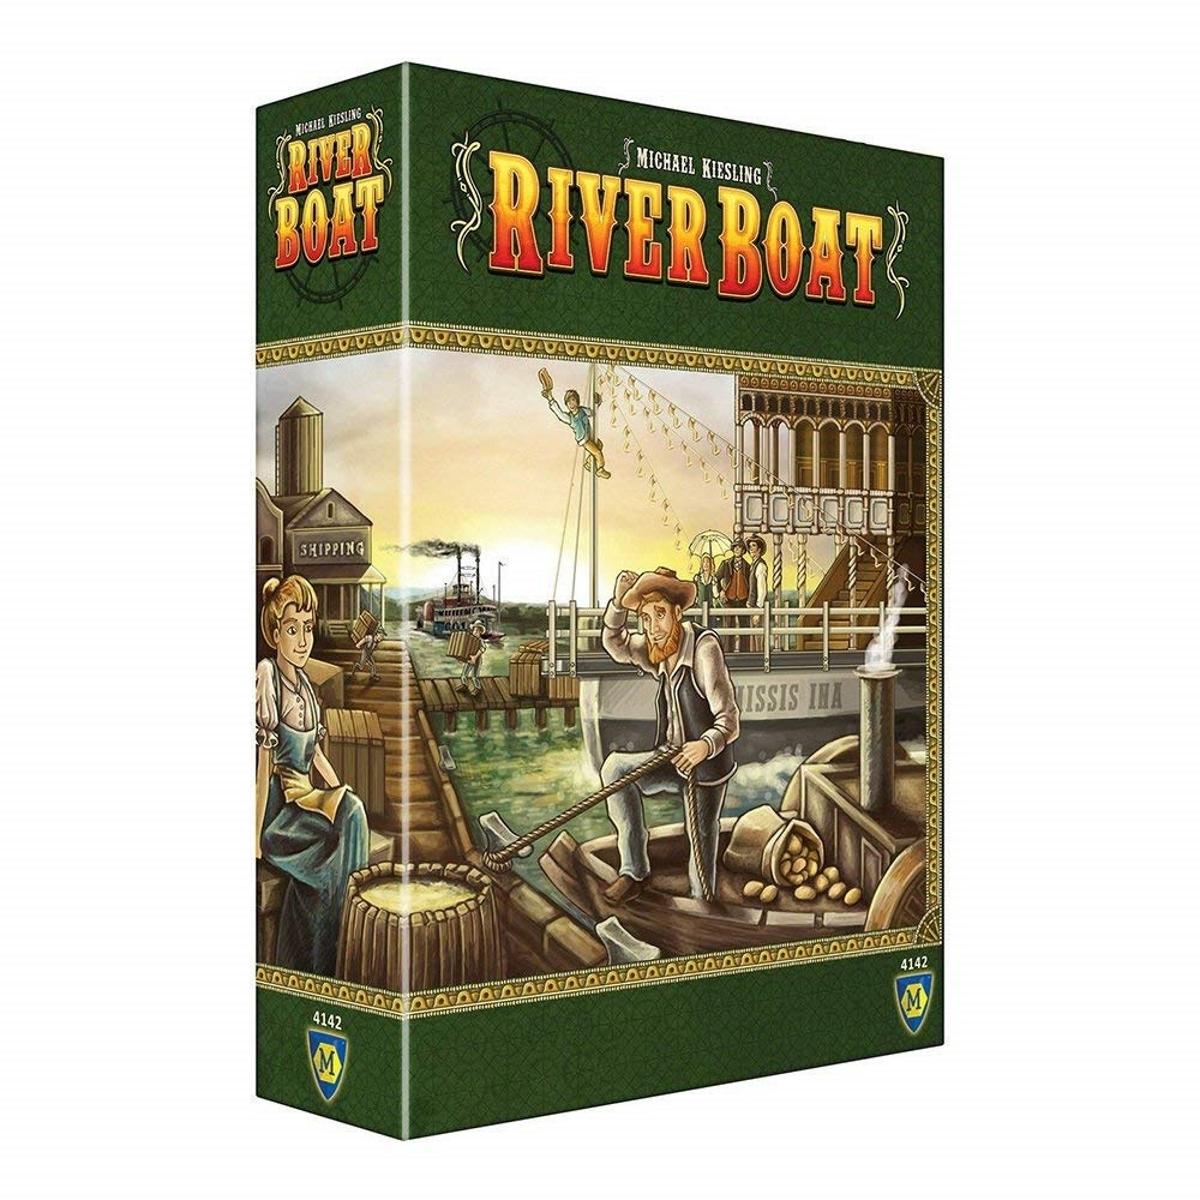 Riverboat 2